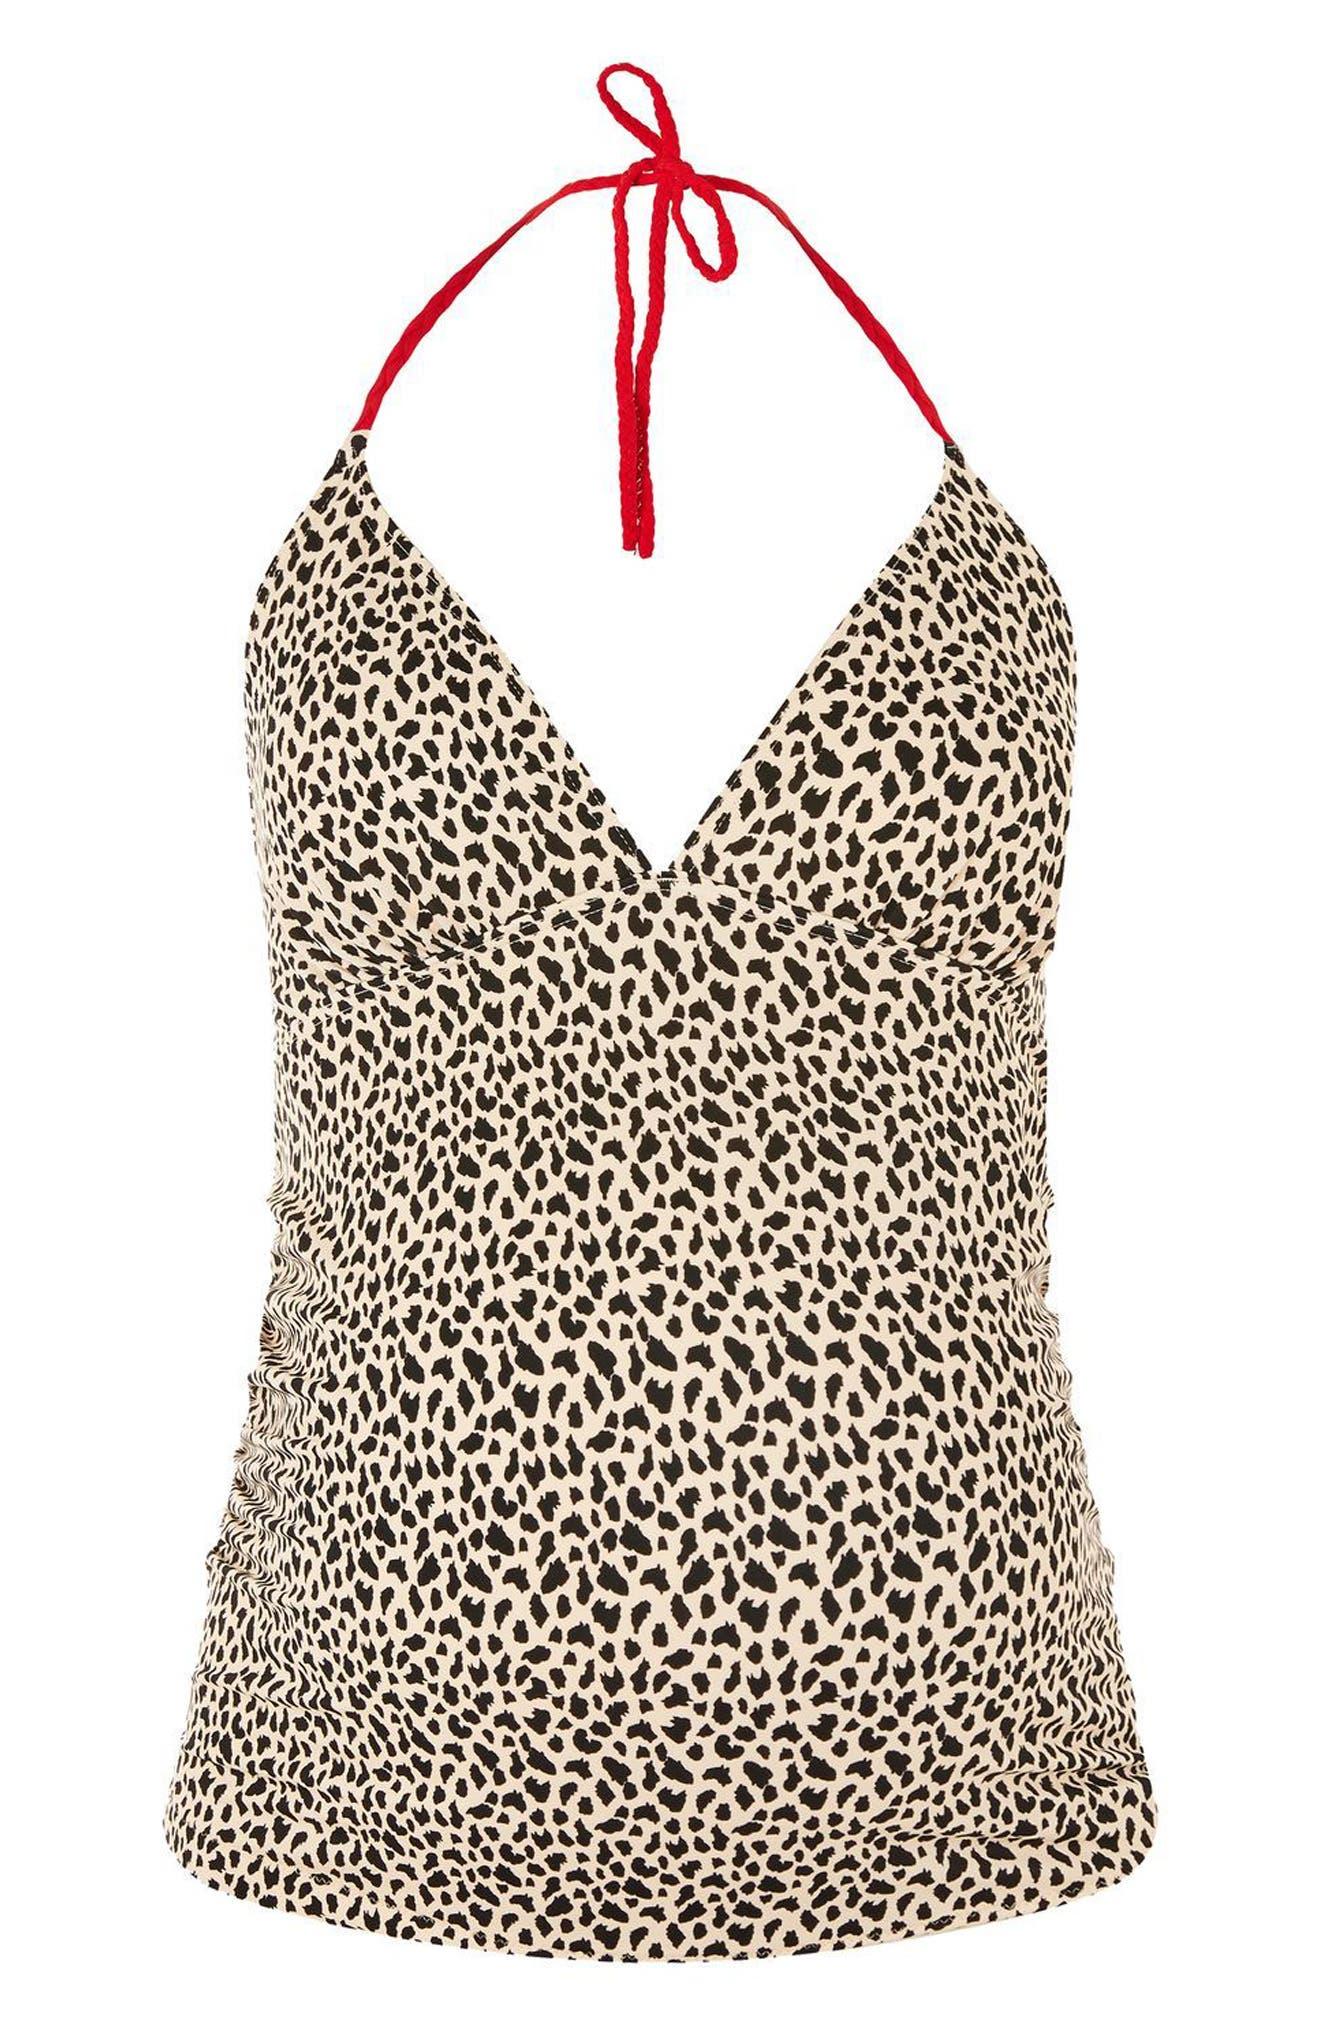 Topshop Leopard Halter Maternity Tankini Top